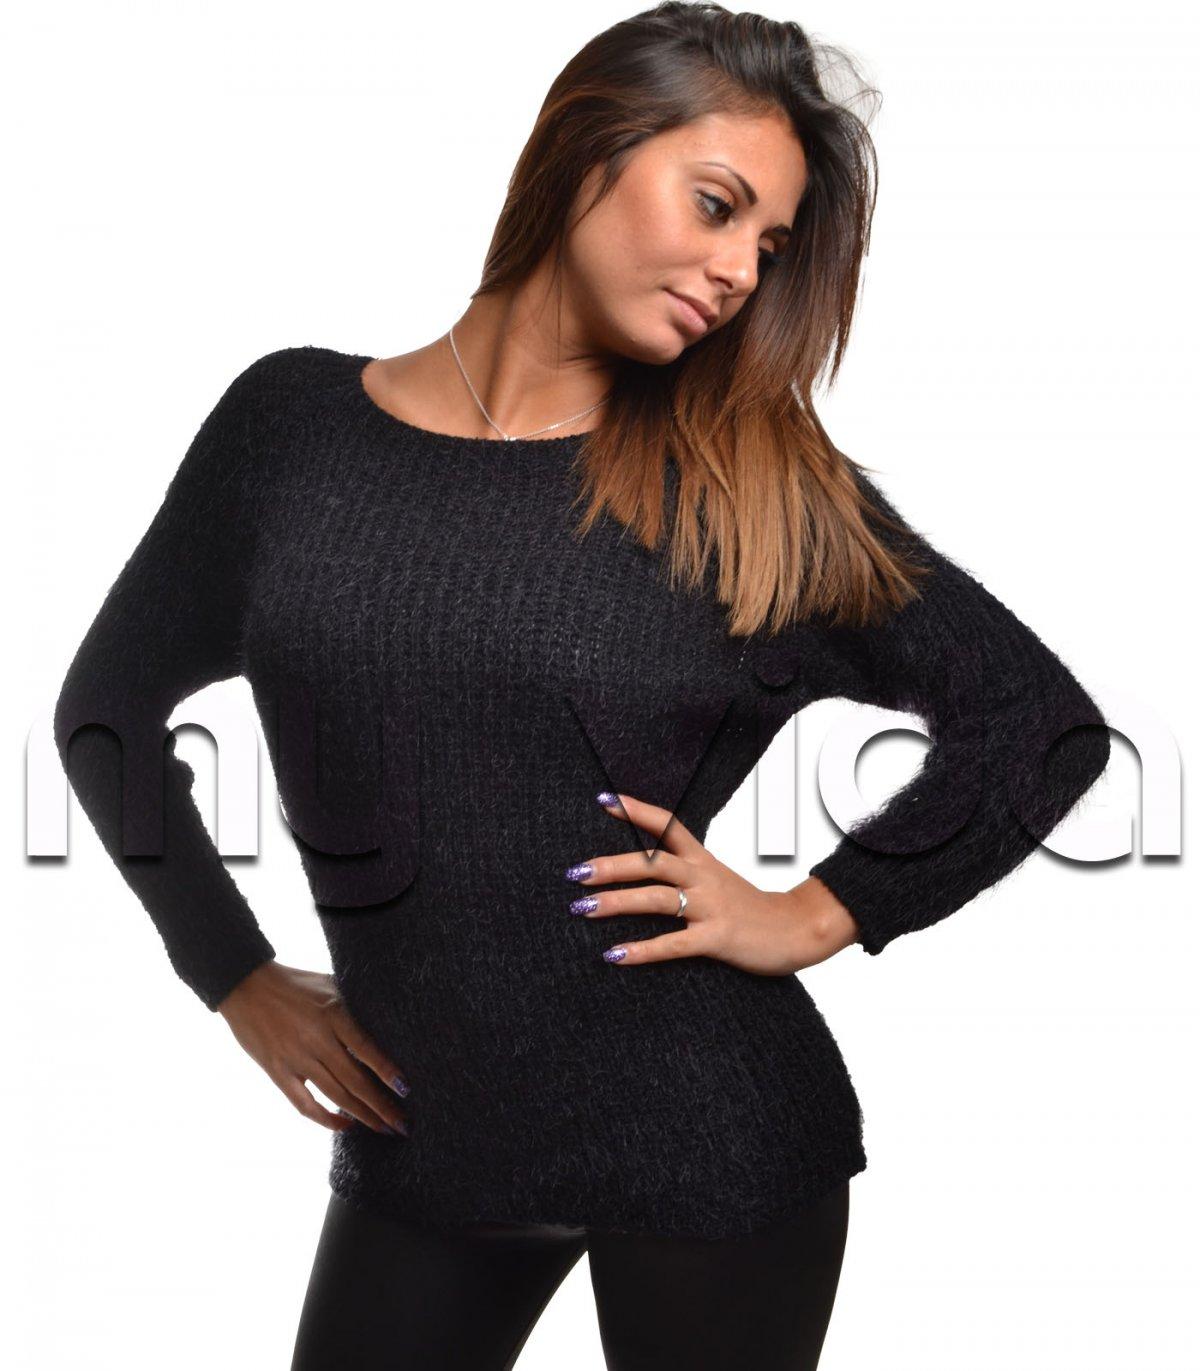 timeless design d6e55 18ac5 Maglione mohair donna pullover lana | My Vida